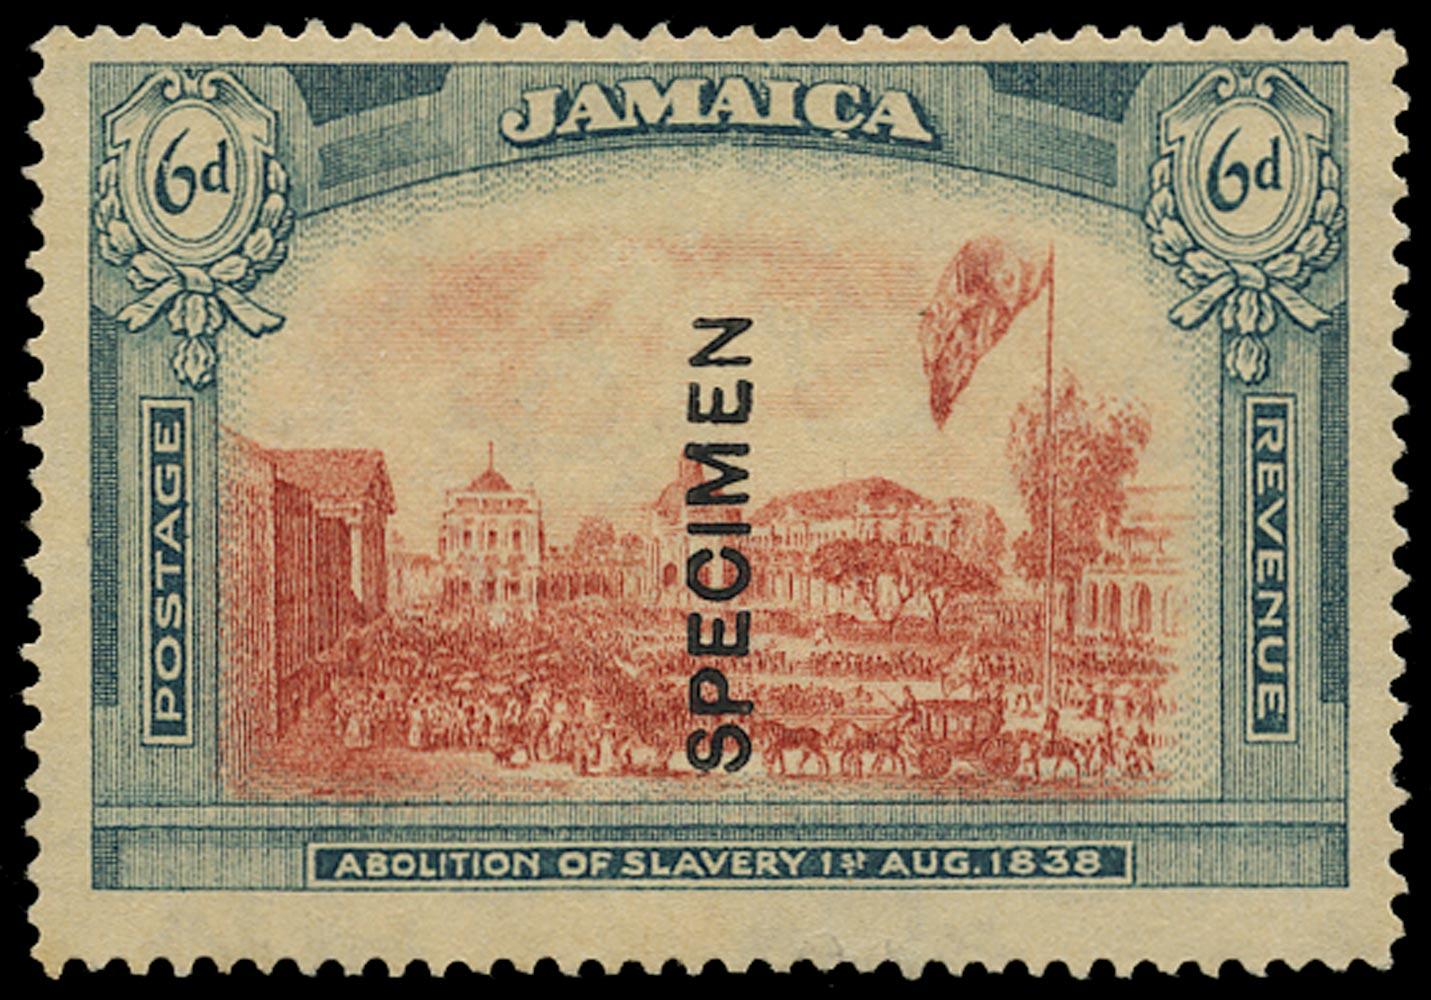 JAMAICA 1921  SG90s var Specimen Abolition of Slavery 6d watermark MCA with abnormal type D9 overprint